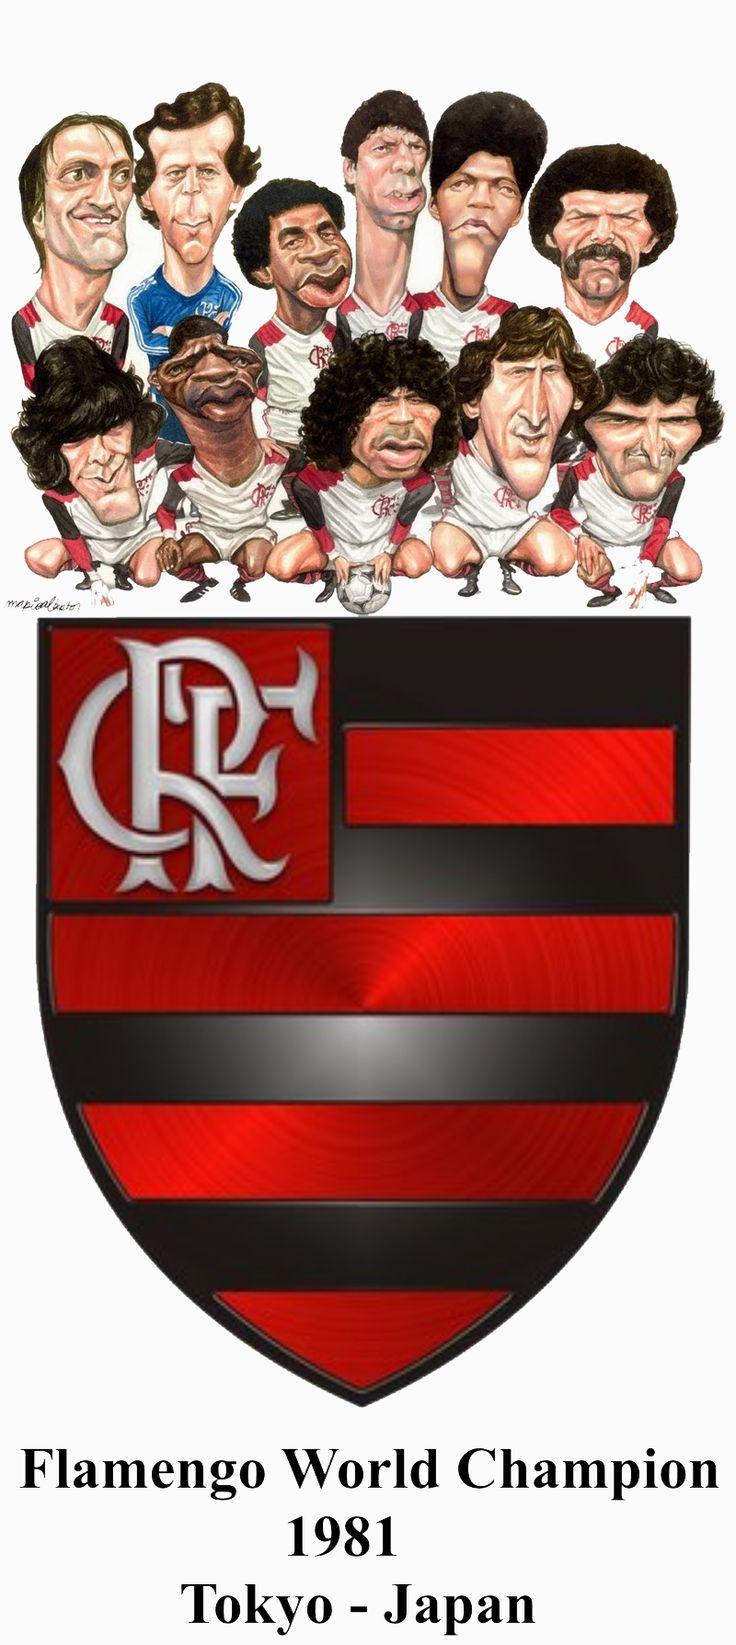 Flamengo World Champion 1981 - Tokyo, Japan